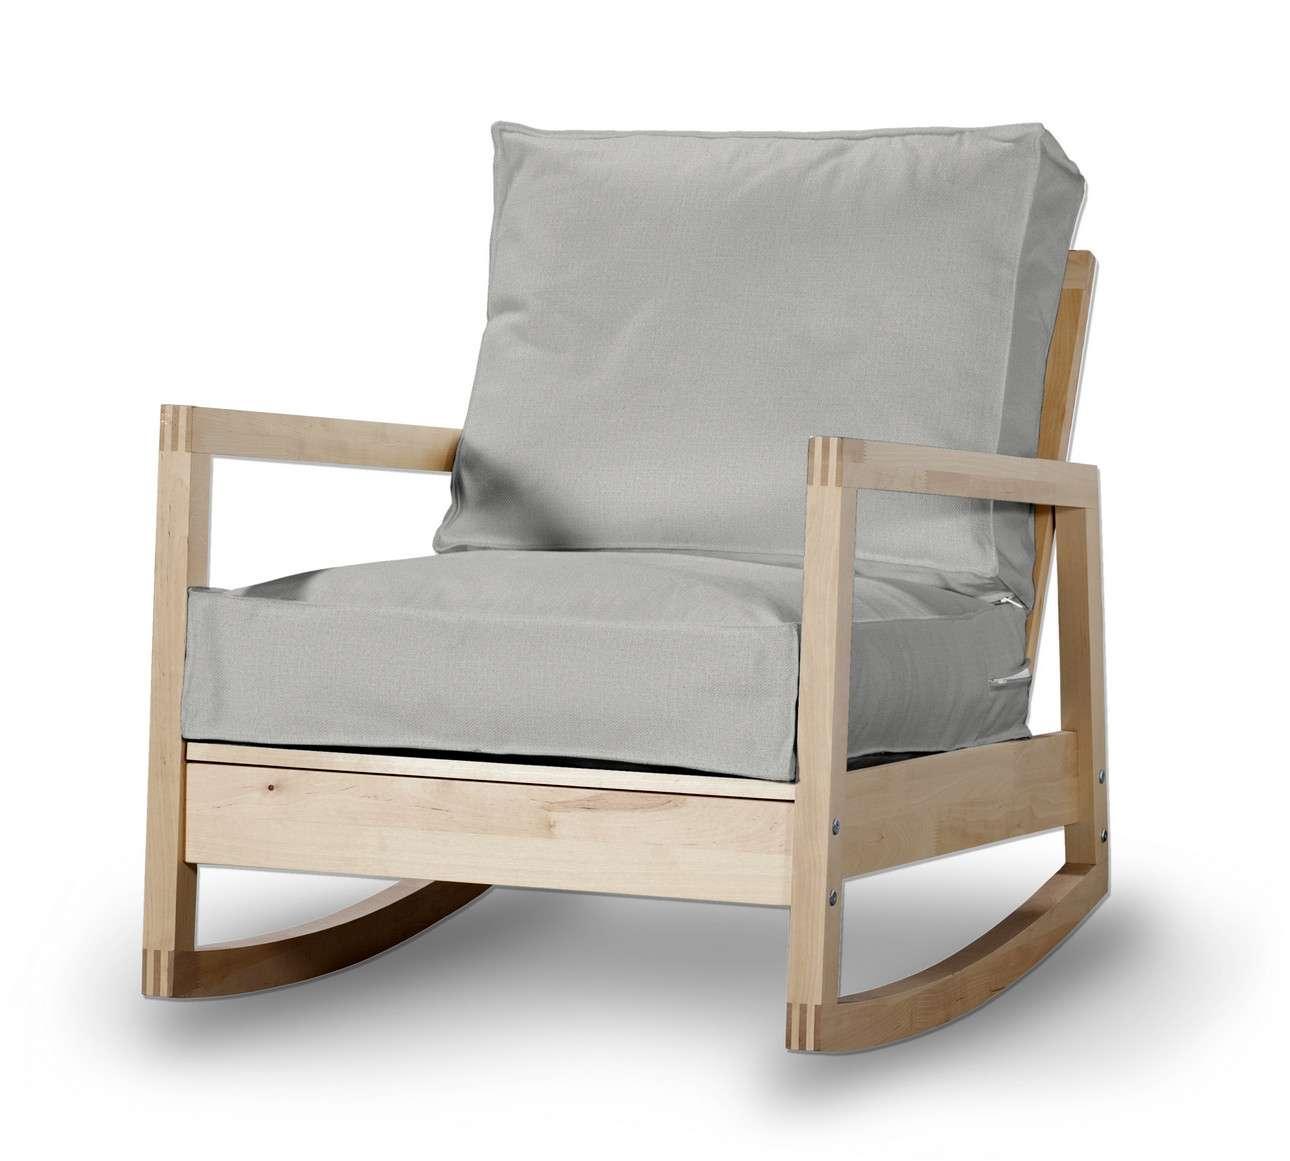 Pokrowiec na fotel Lillberg w kolekcji Living, tkanina: 161-18